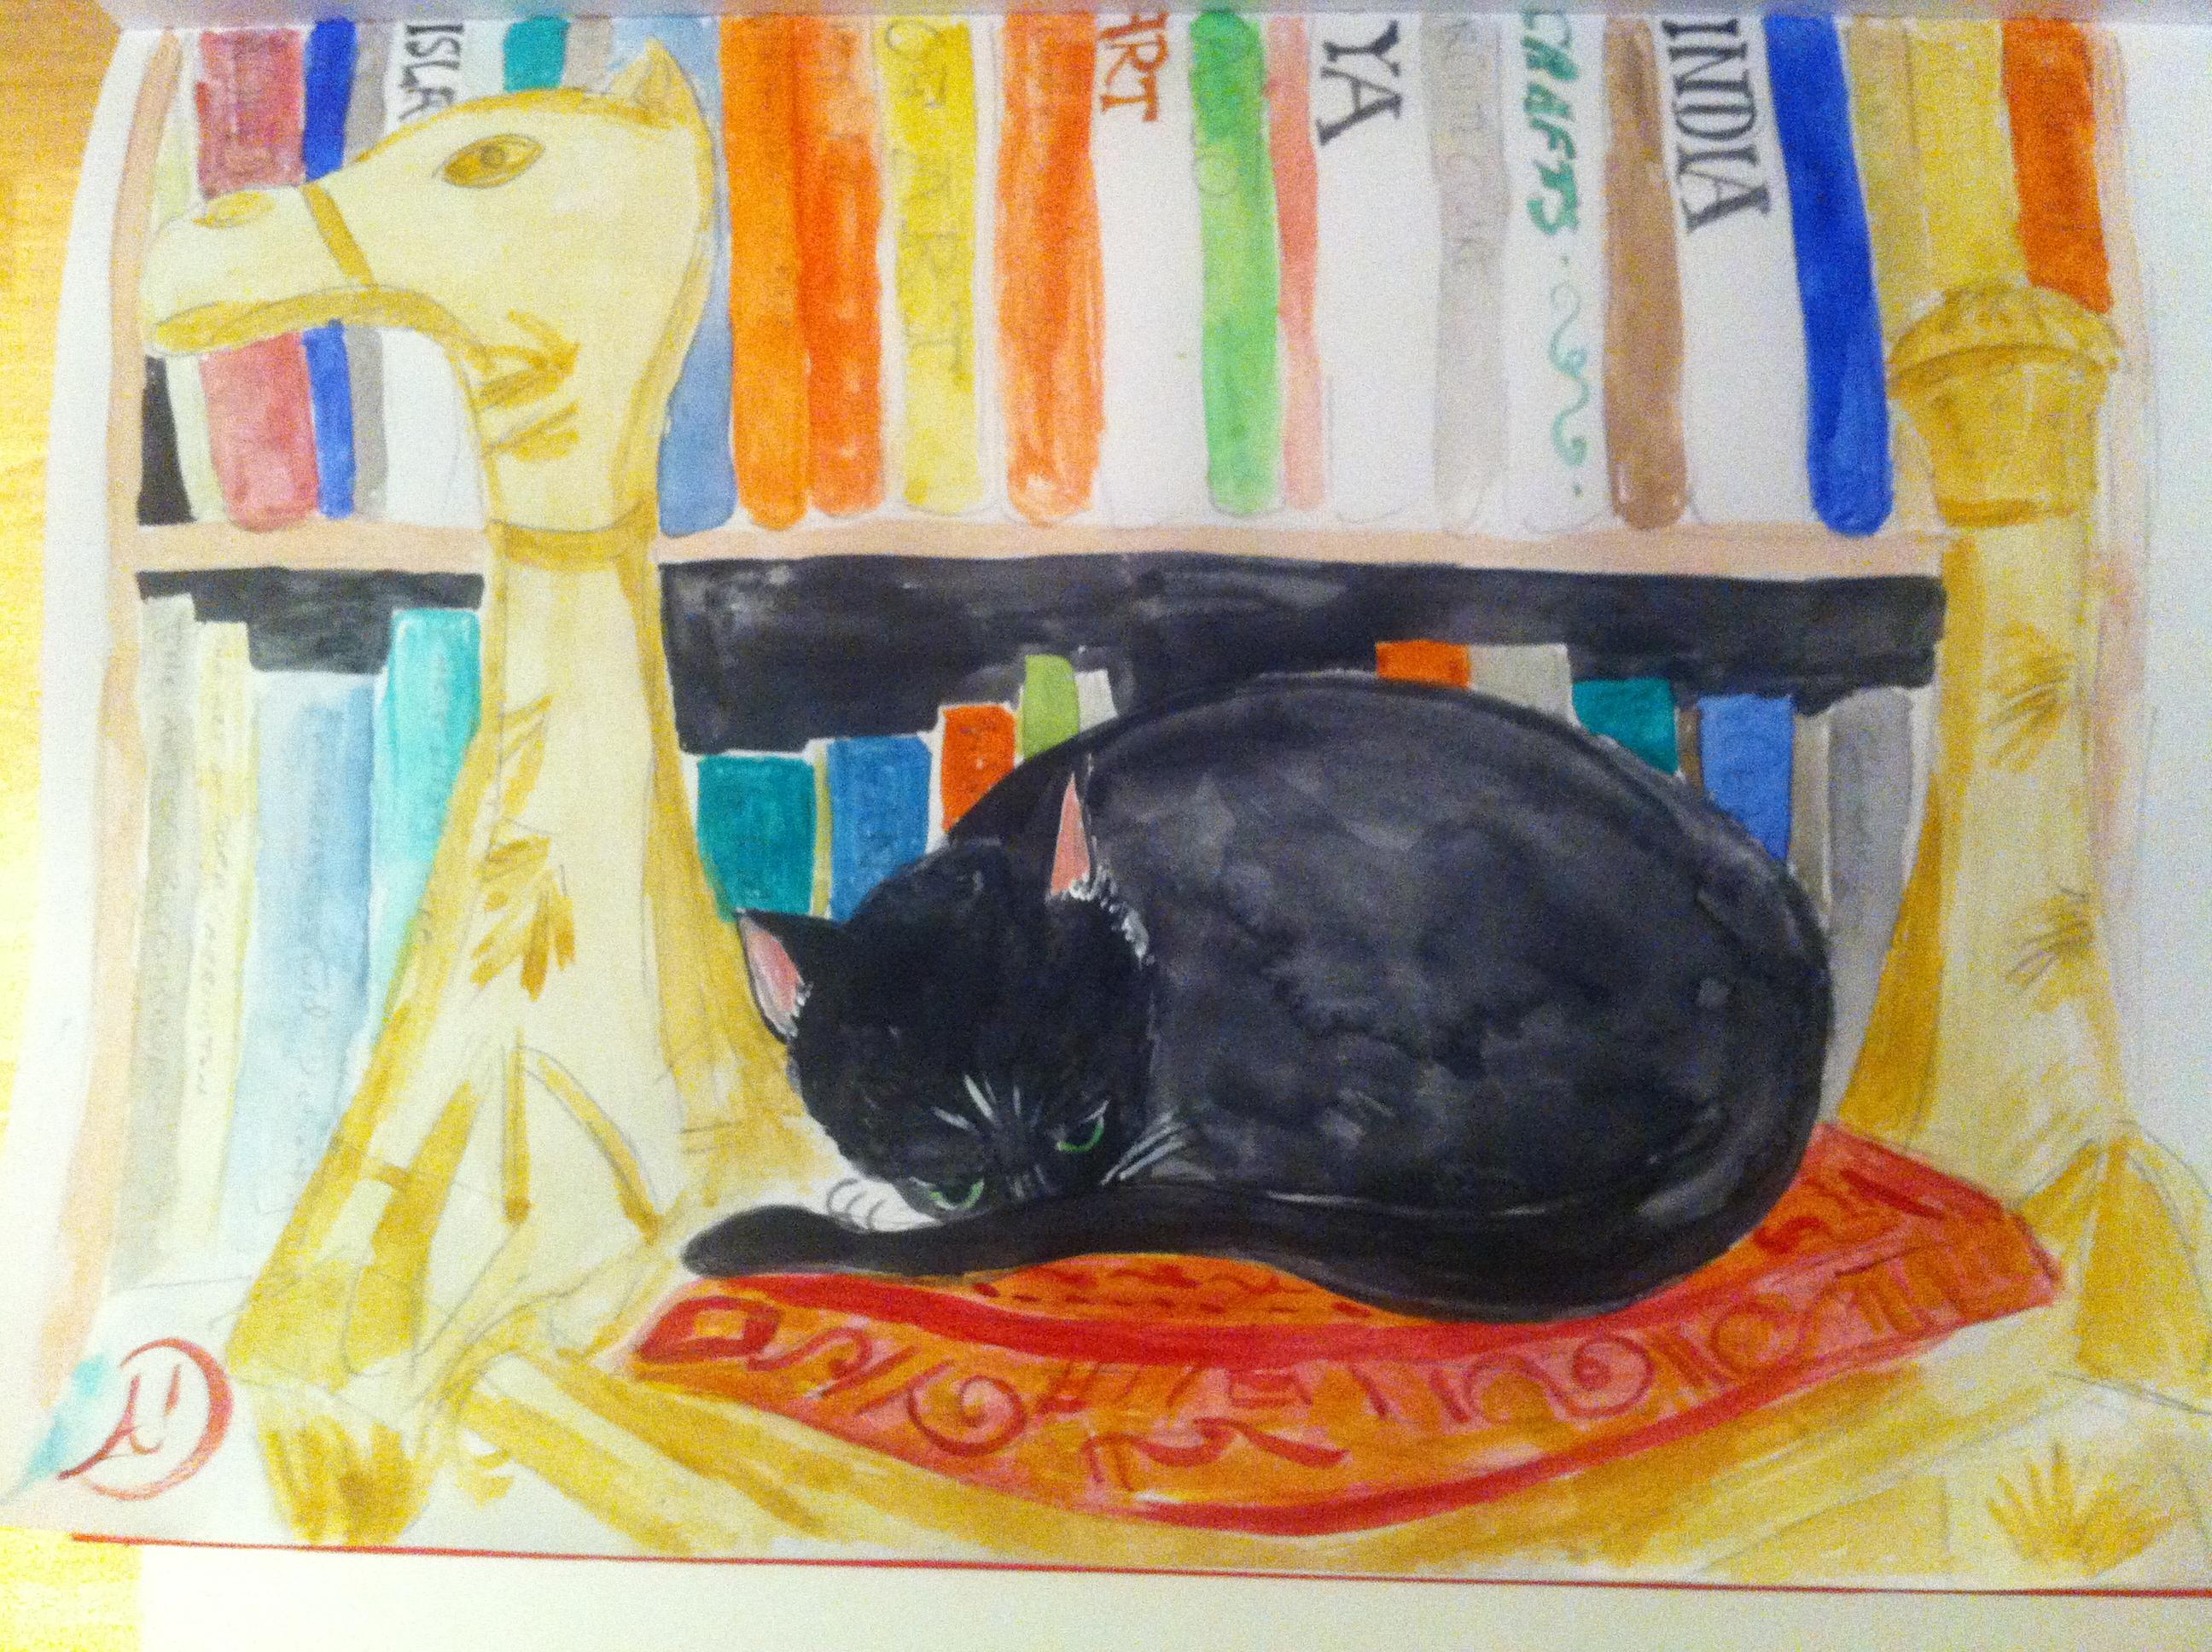 My old cat Brzeska having a nap on the Syrian camel foot stool.